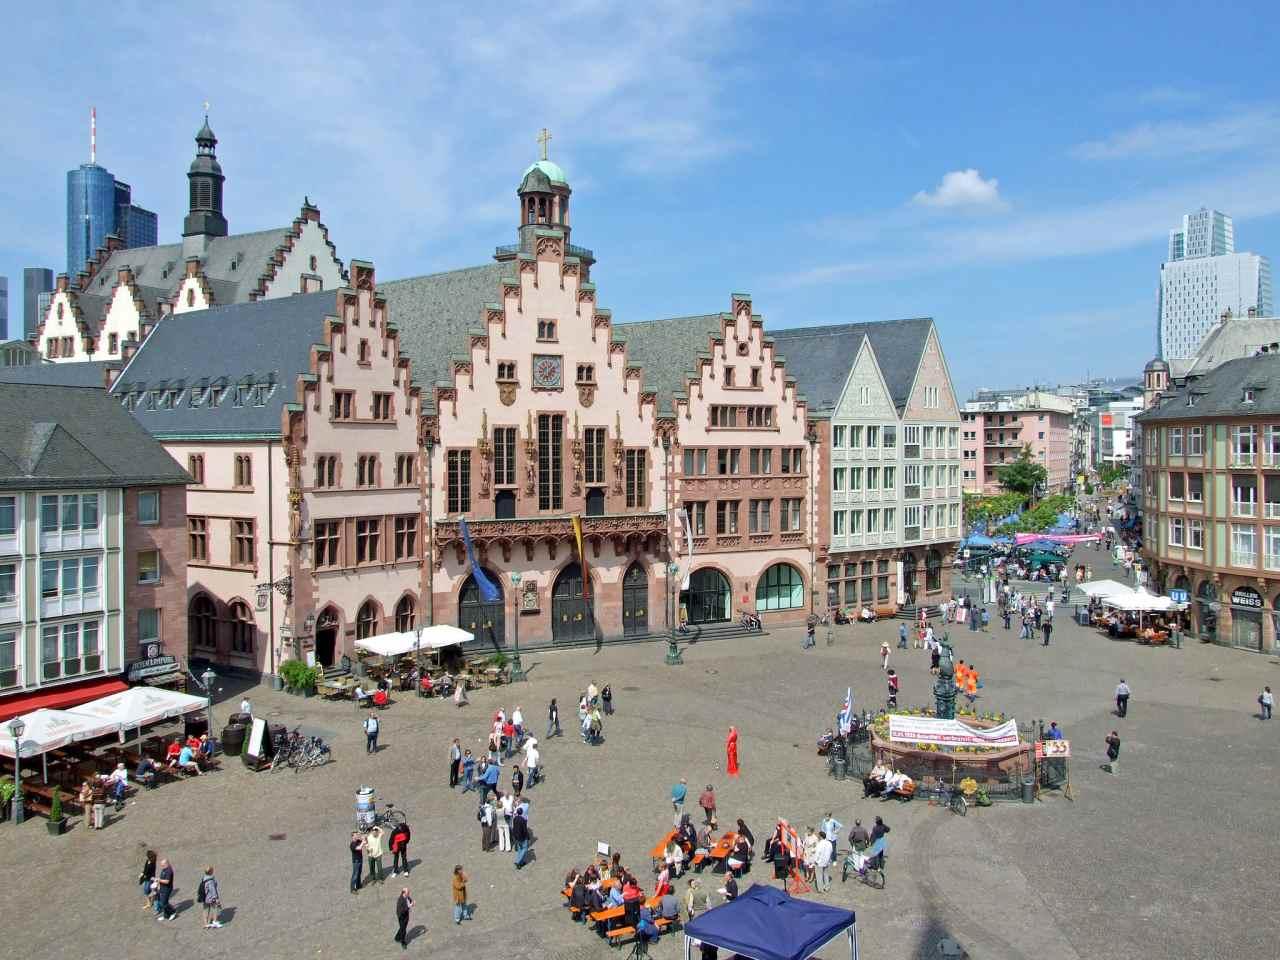 Römer, Frankfurt, Germany